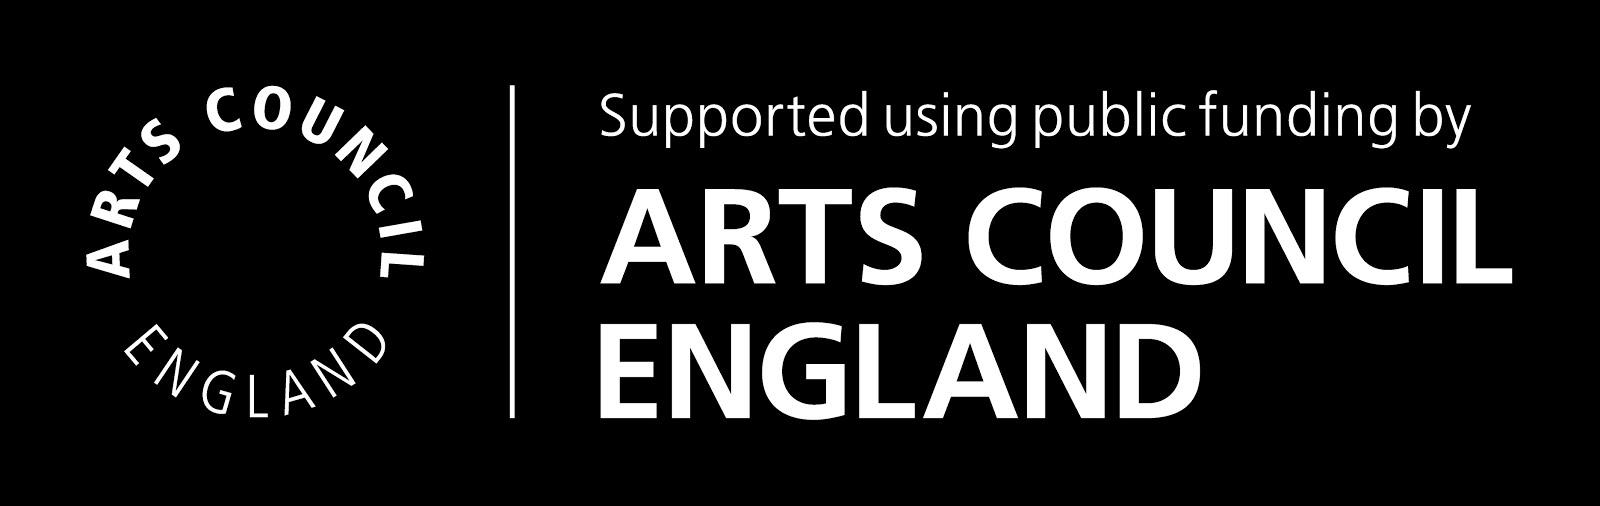 www.artscouncil.org.uk